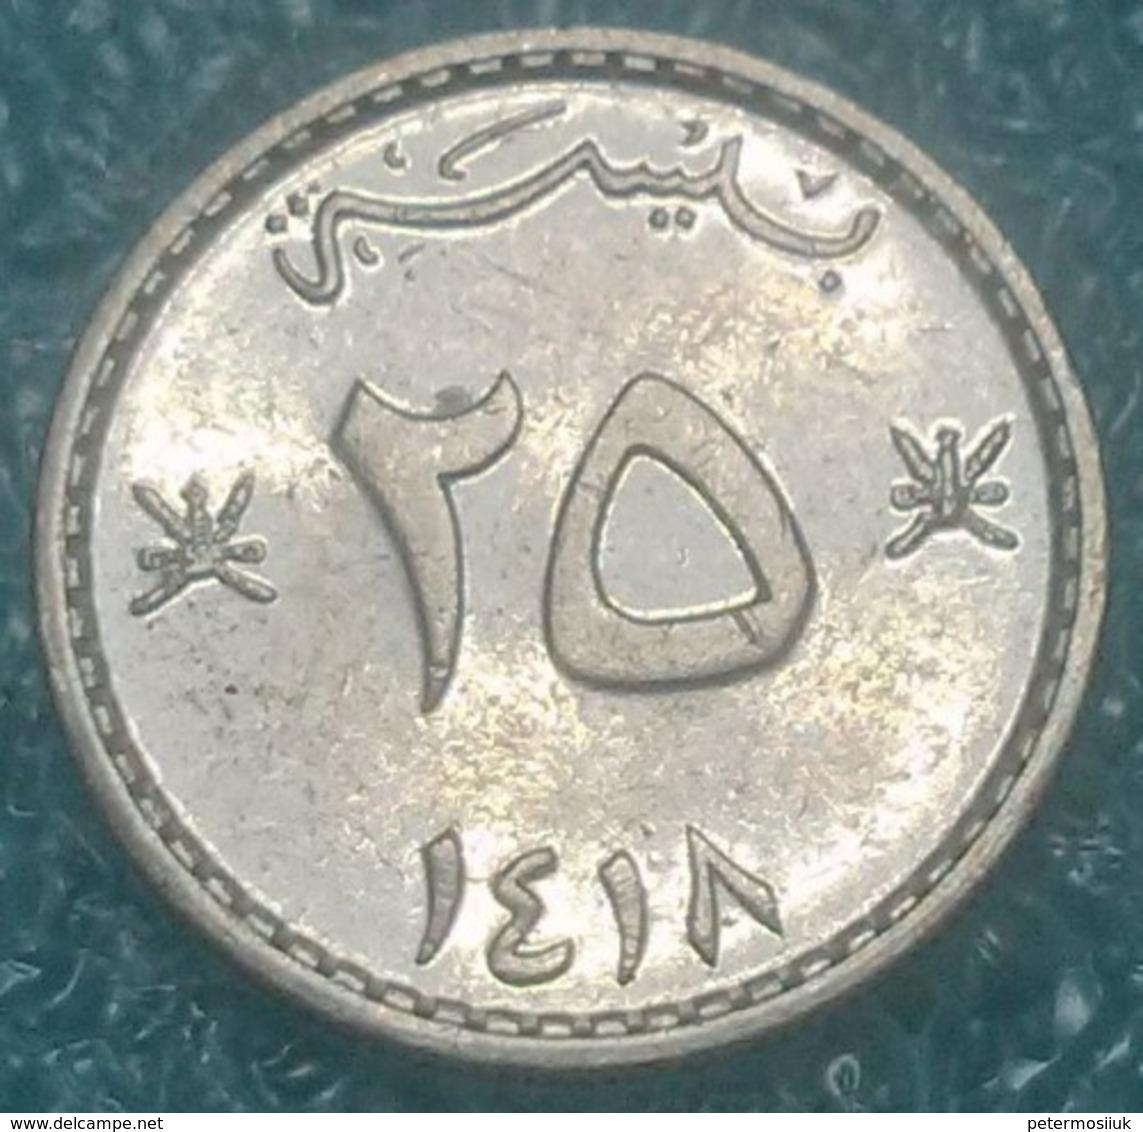 Oman 25 Baisa, 1418 (1997) -4143 - Oman